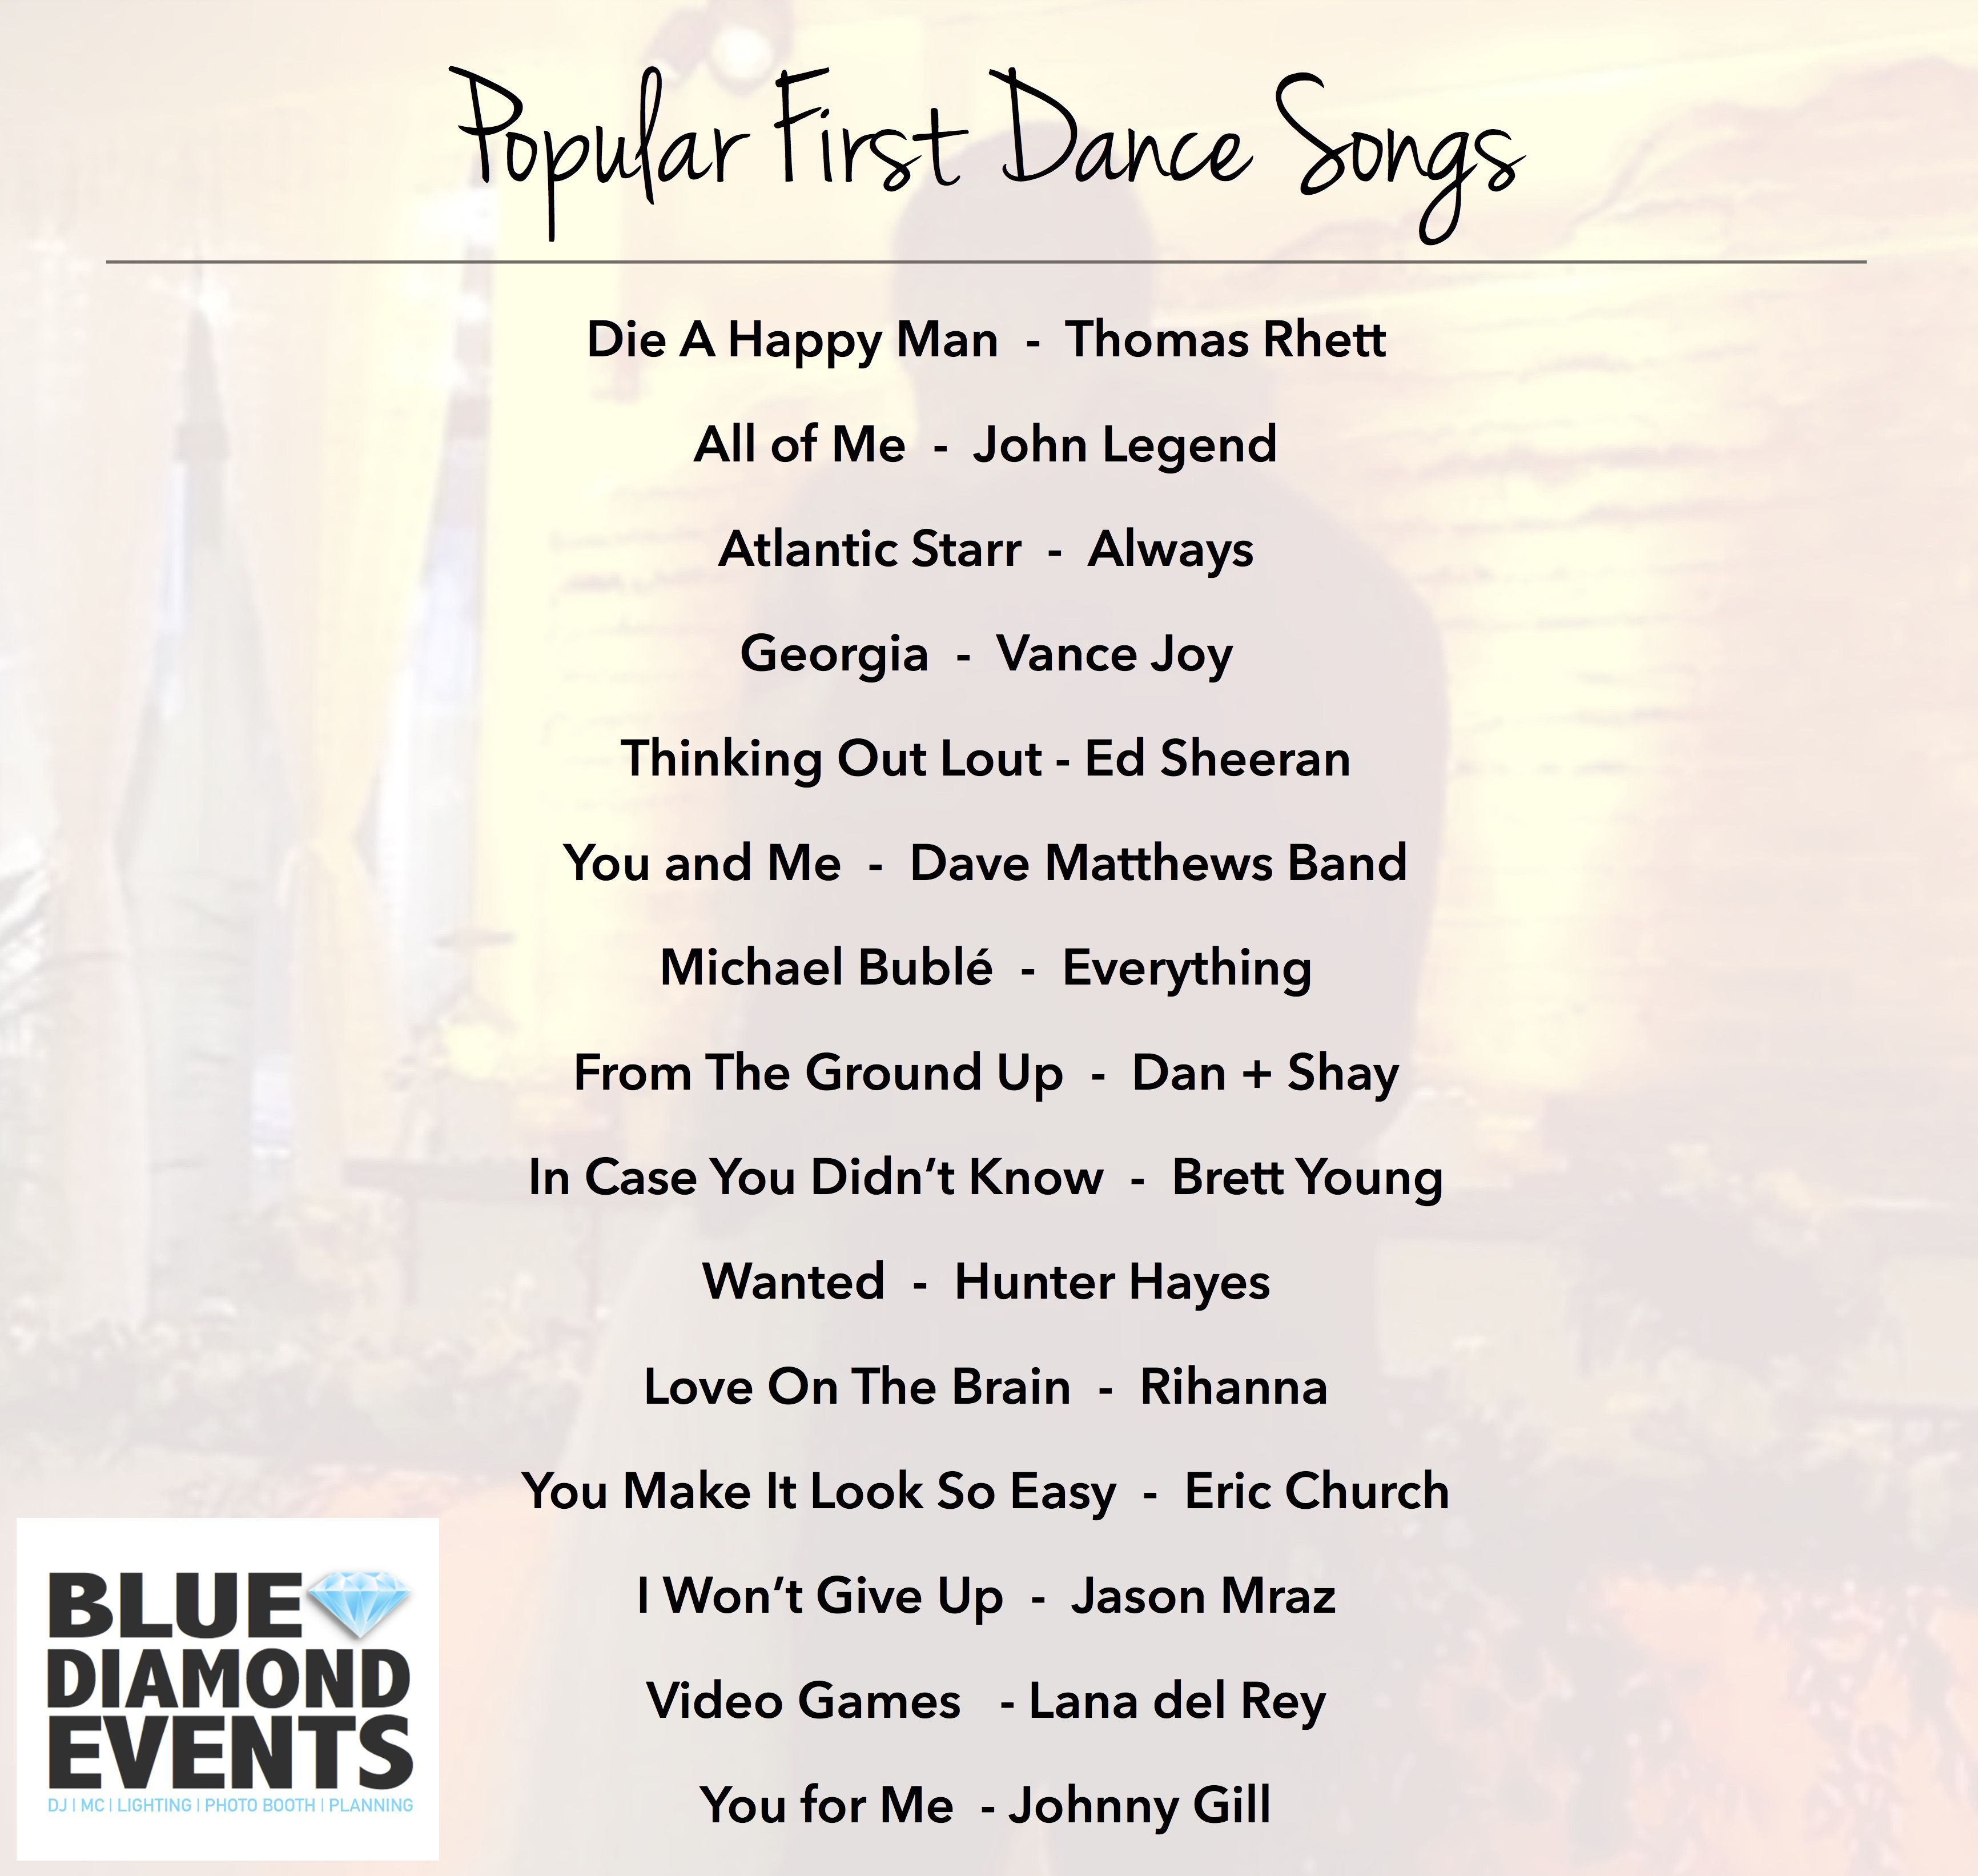 Popular First Dance Songs